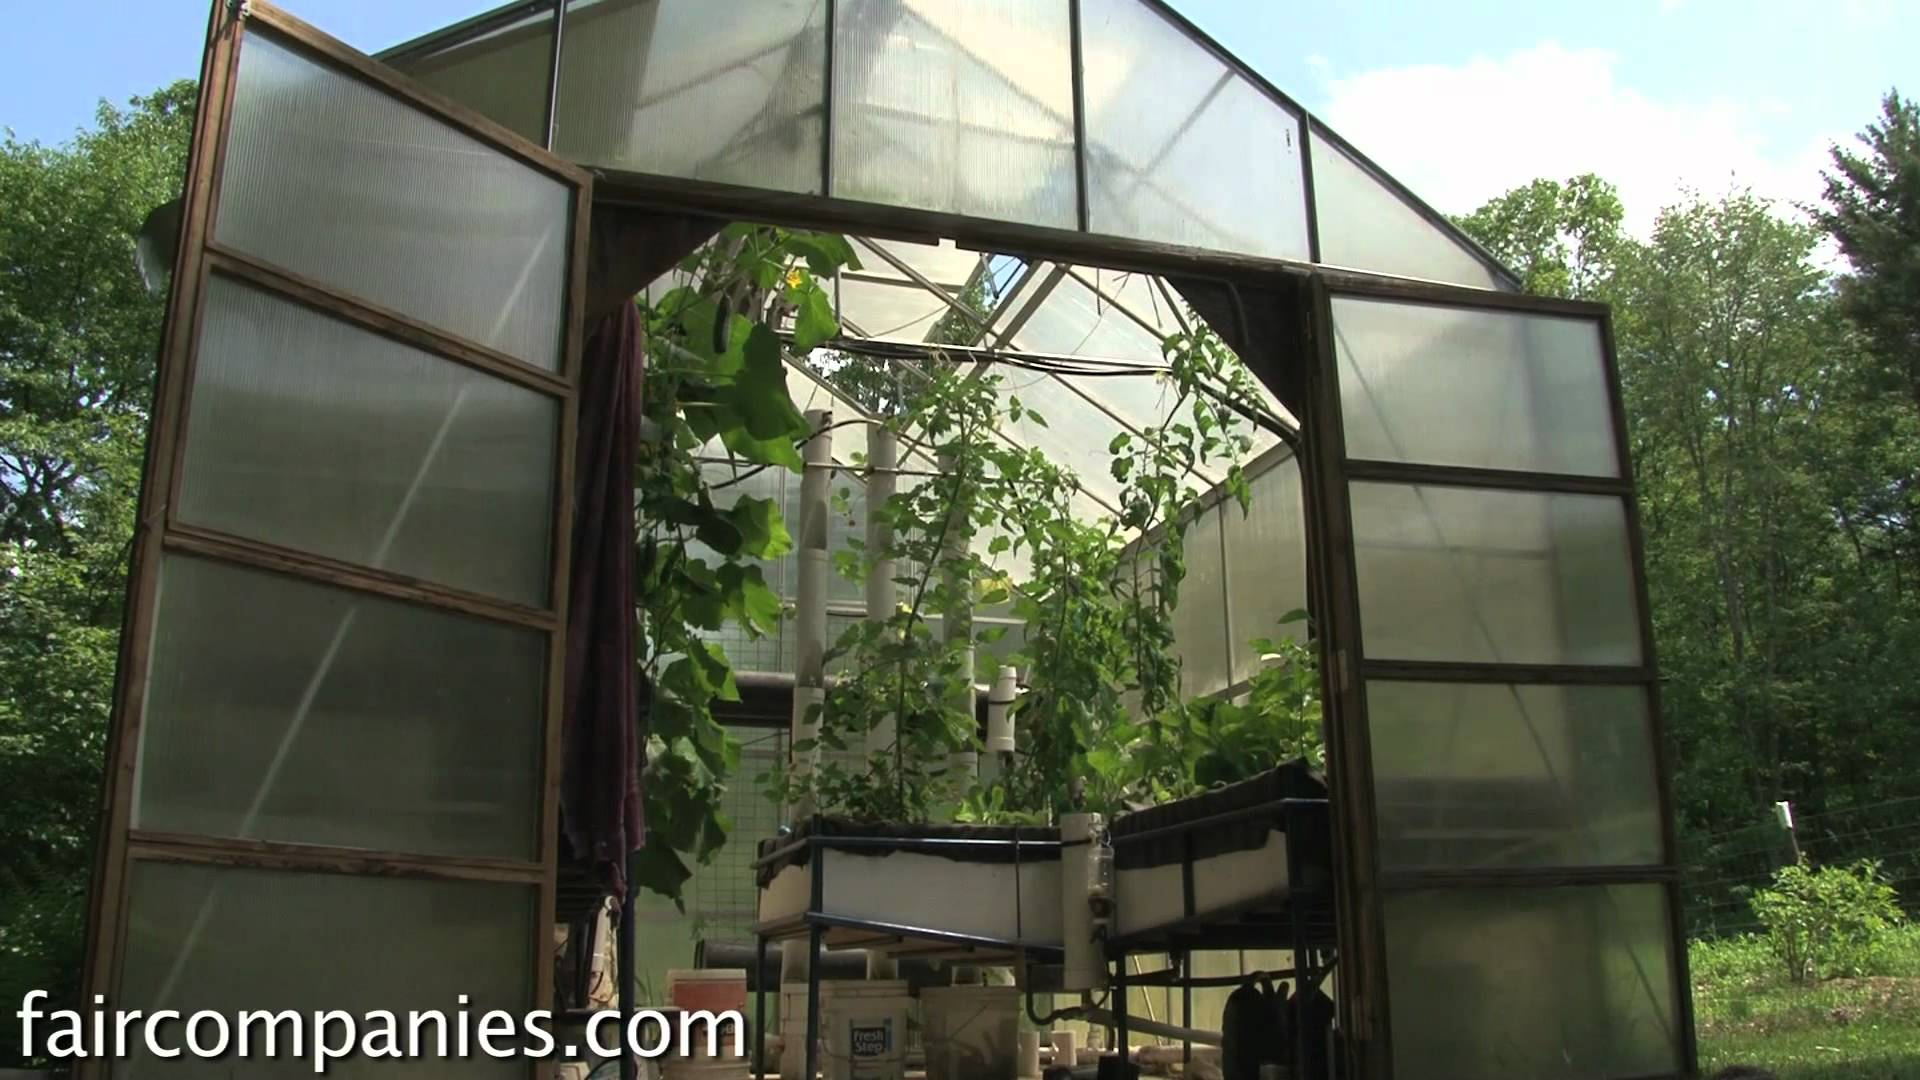 Backyard Aquaponics – A DIY System To Farm Fish With Vegetables...